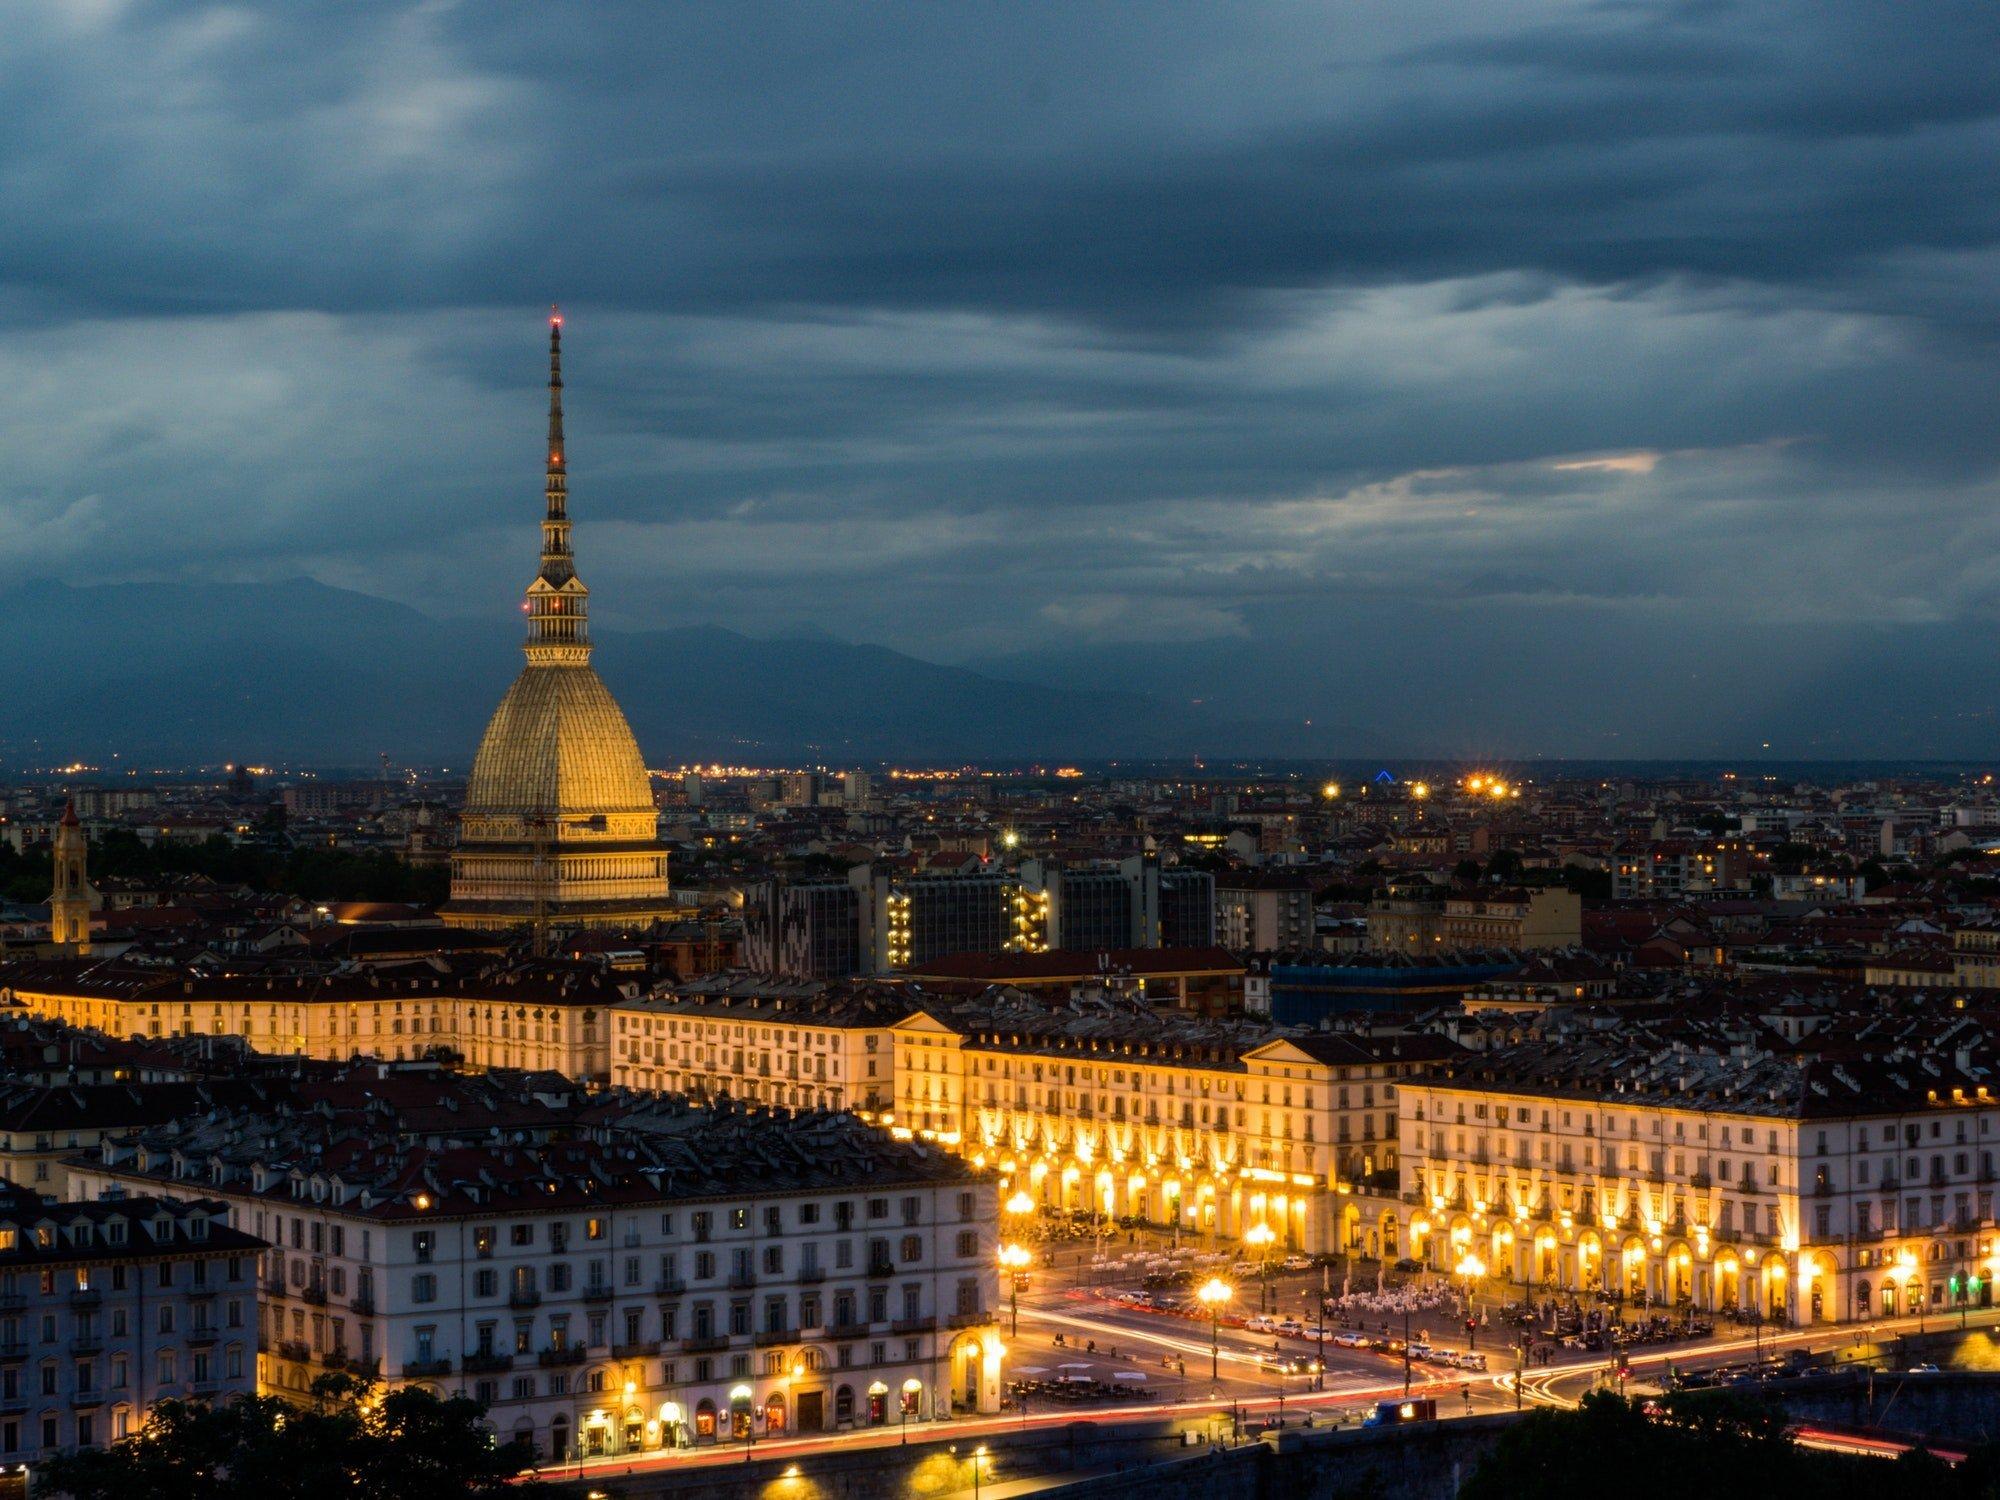 Turin evening skyline with mole Antonelliana landmark